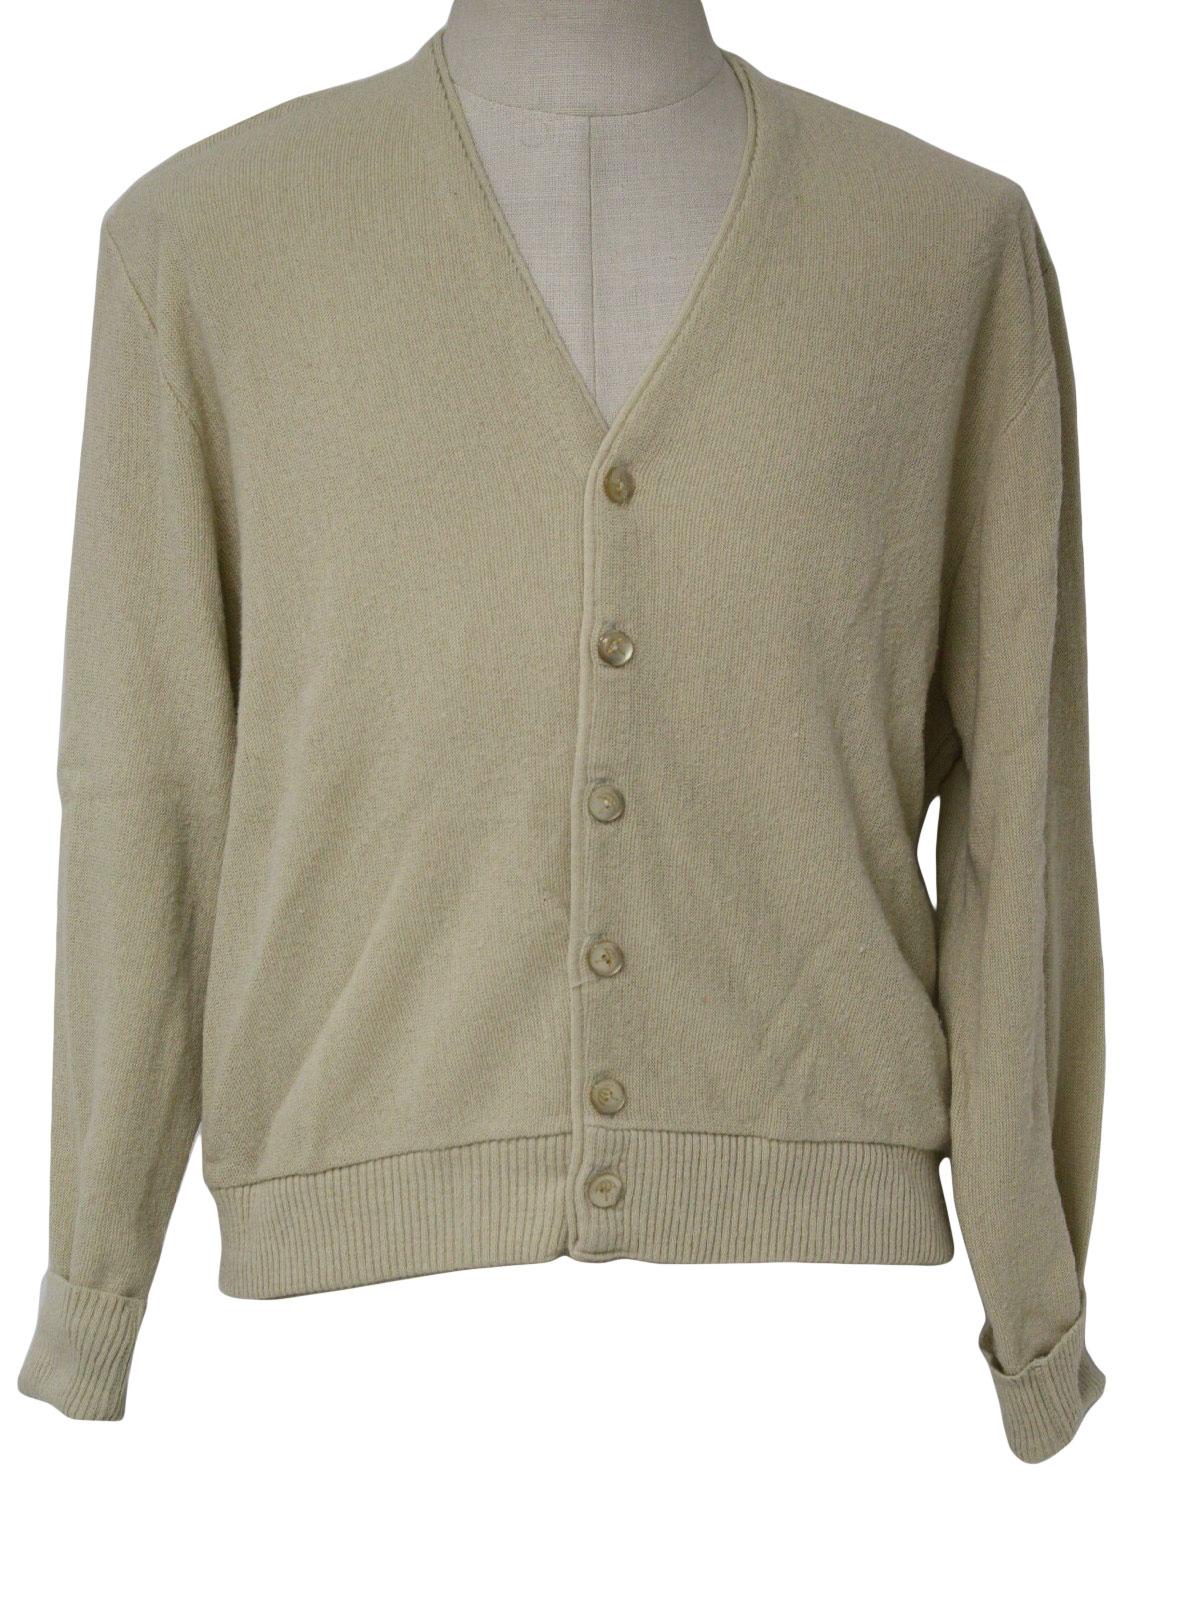 70s Caridgan Sweater Arnold Palmer Robert Bruce 70s